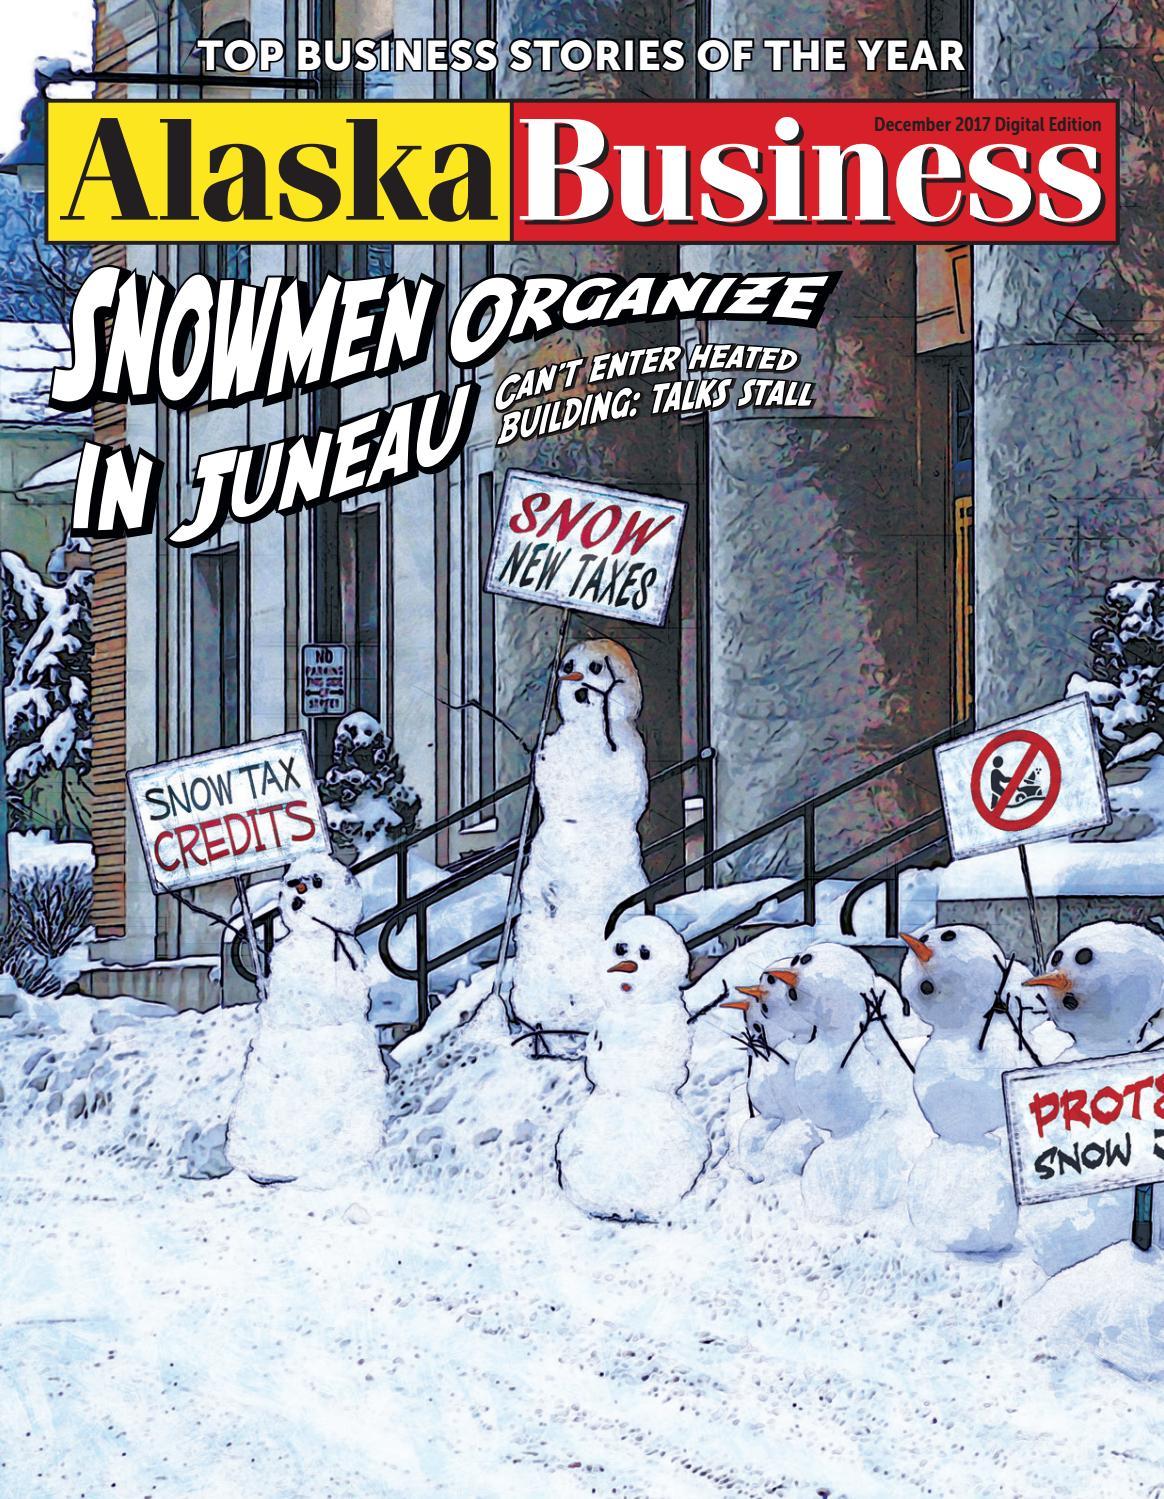 Alaska Business December 2017 by Alaska Business - issuu 3eec87907